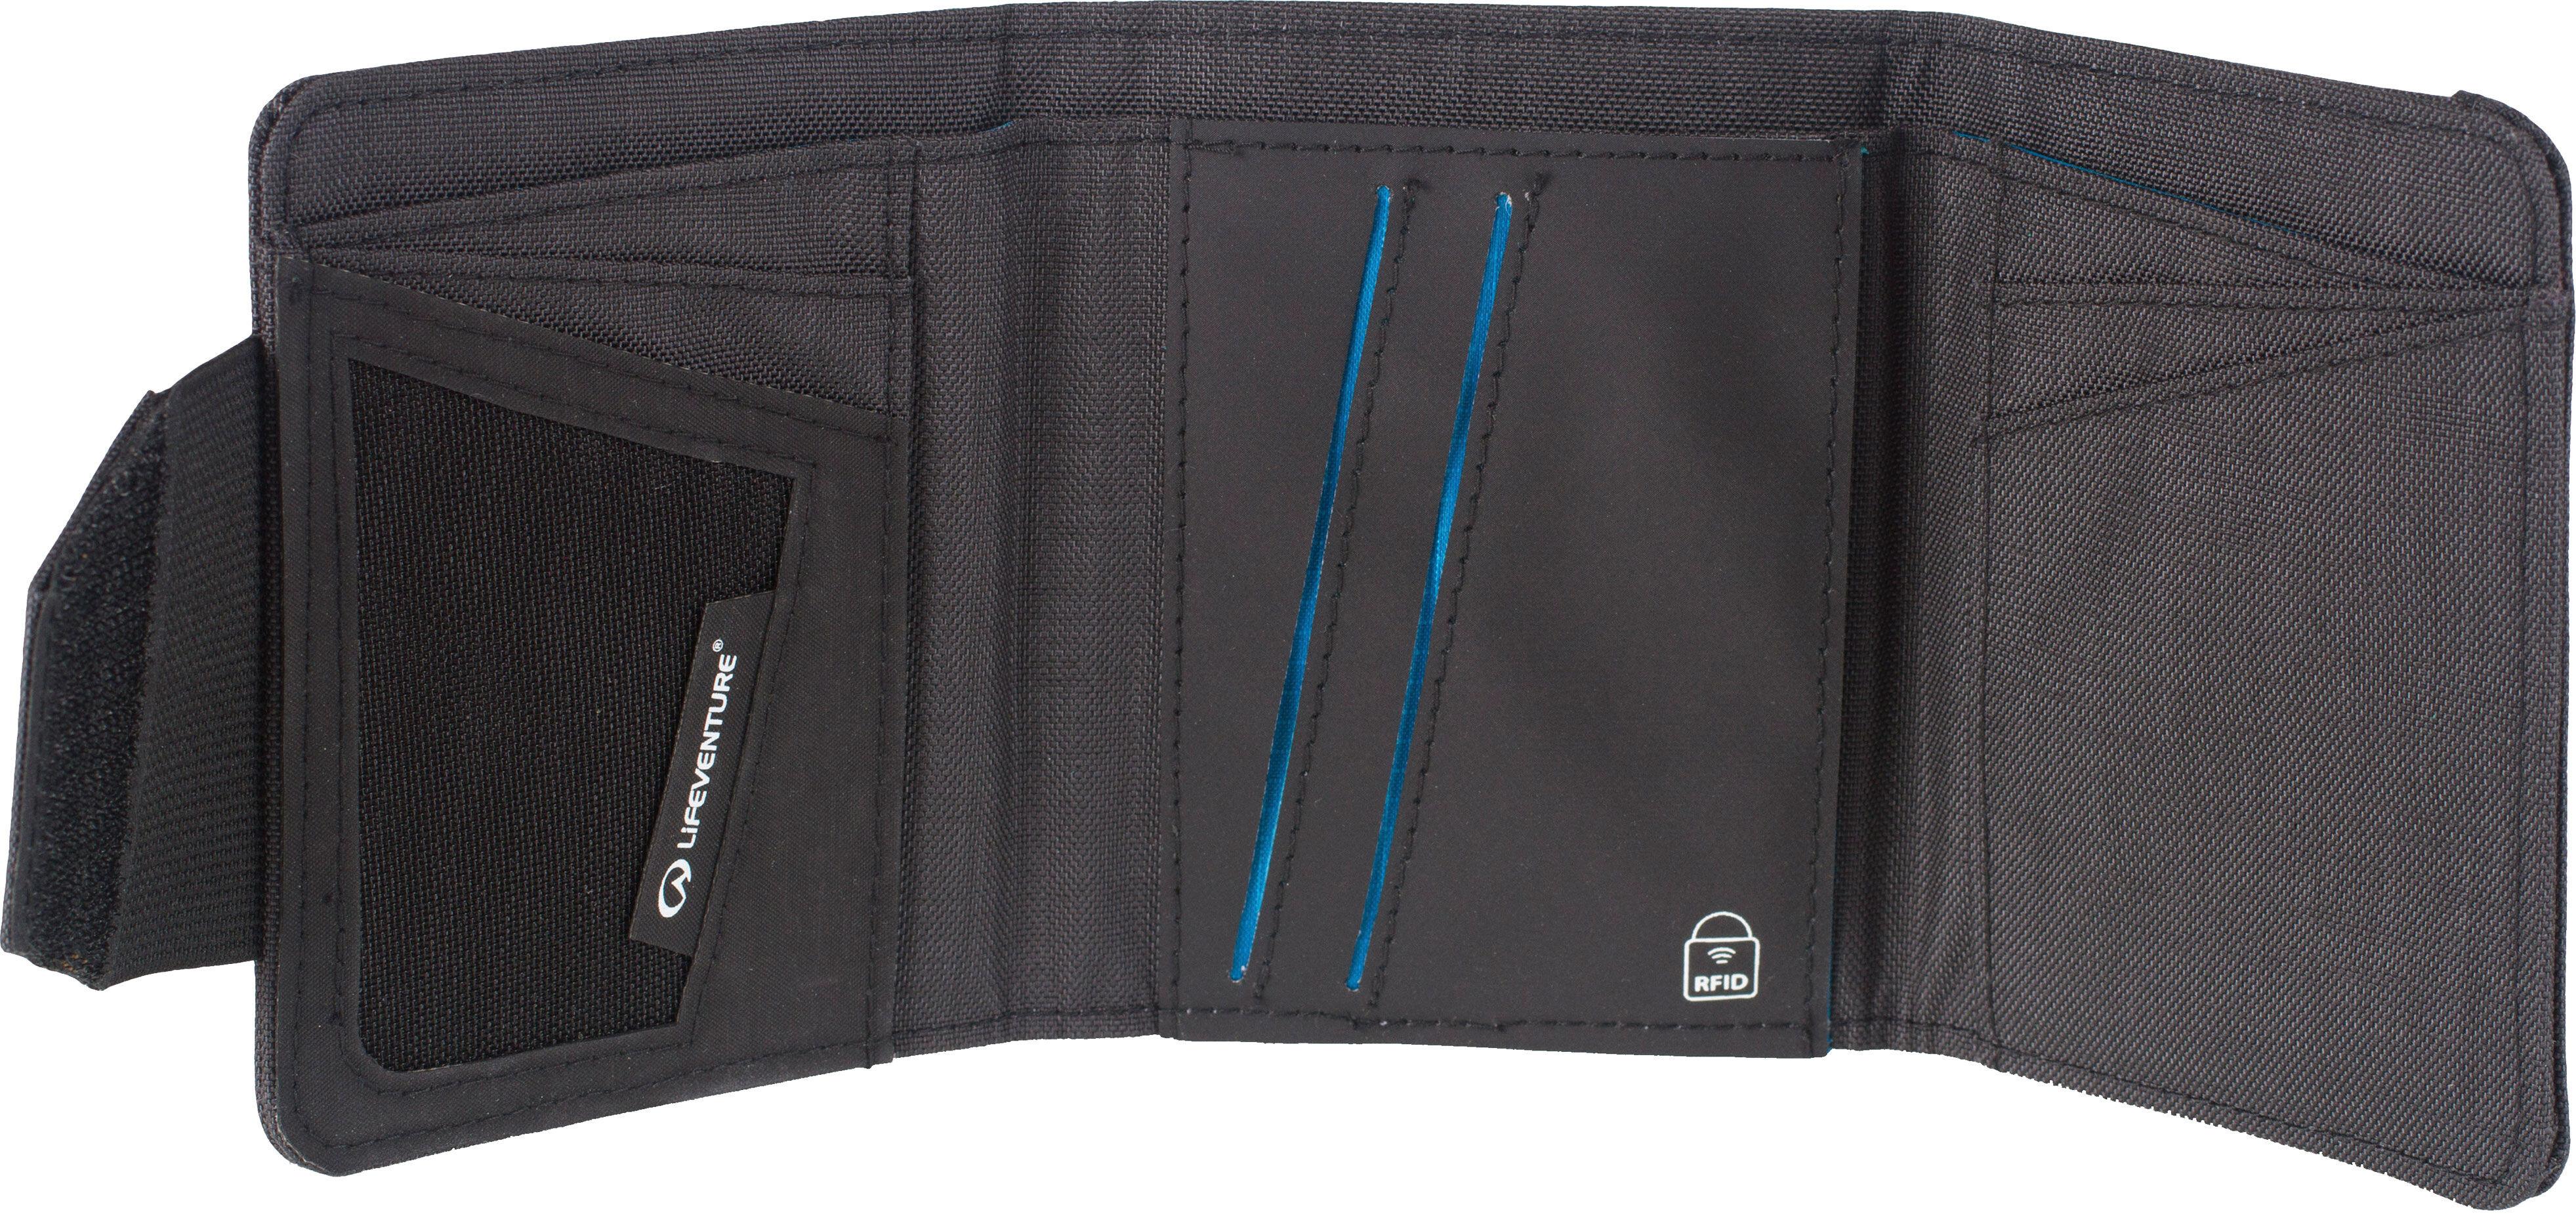 dbb4505f478fc Jack Wolfskin. Cashbag Wallet RFID Portfel czarny. 85